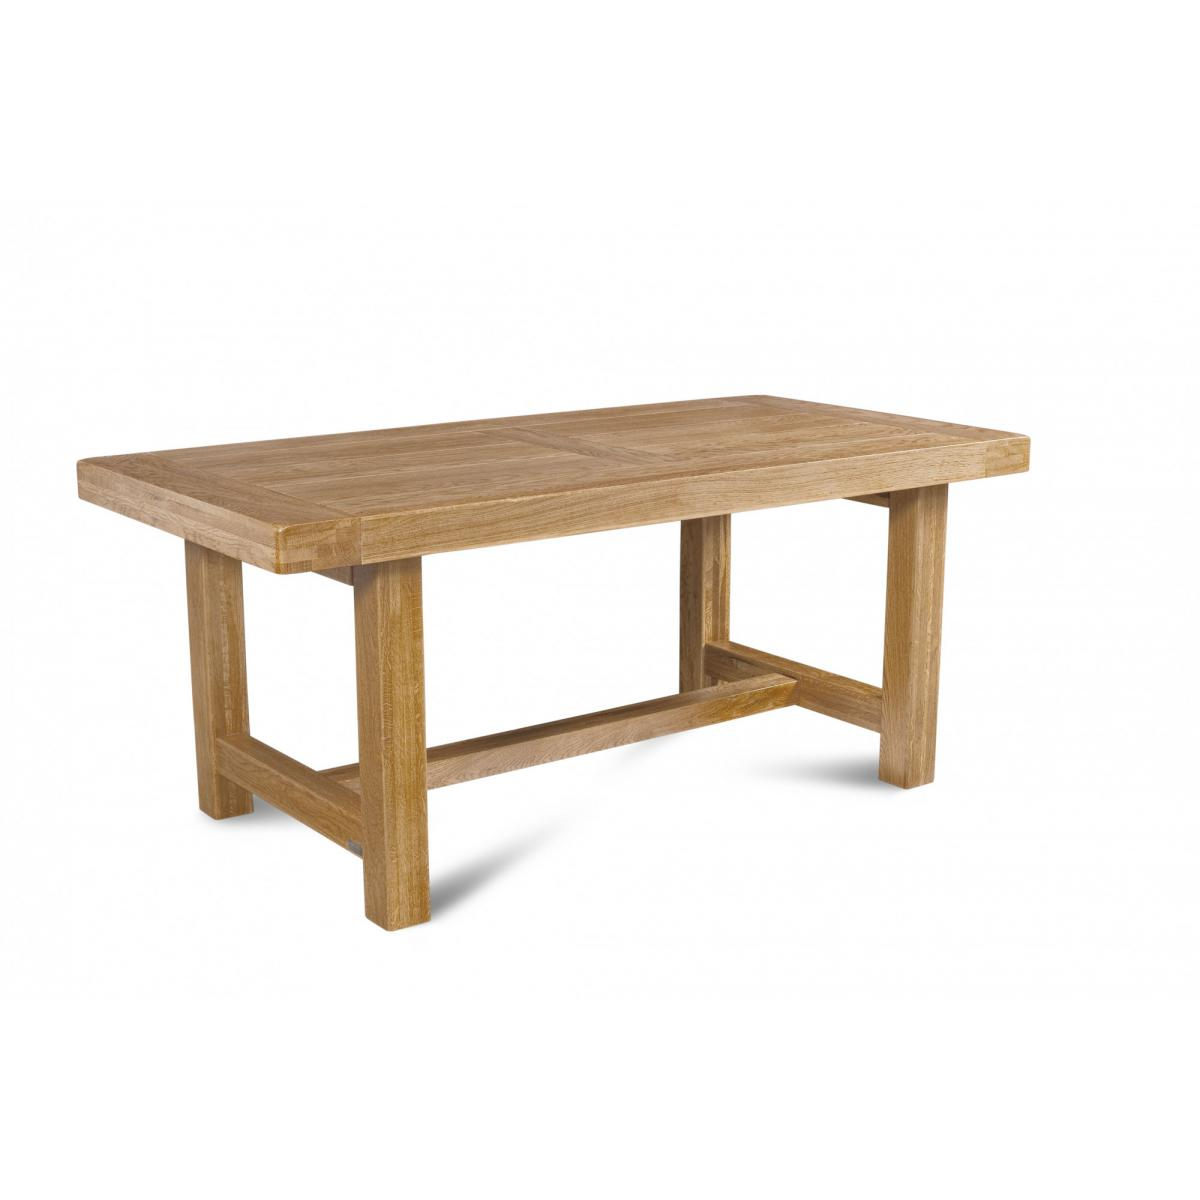 HELLIN Table de ferme campagnarde - bois chêne massif